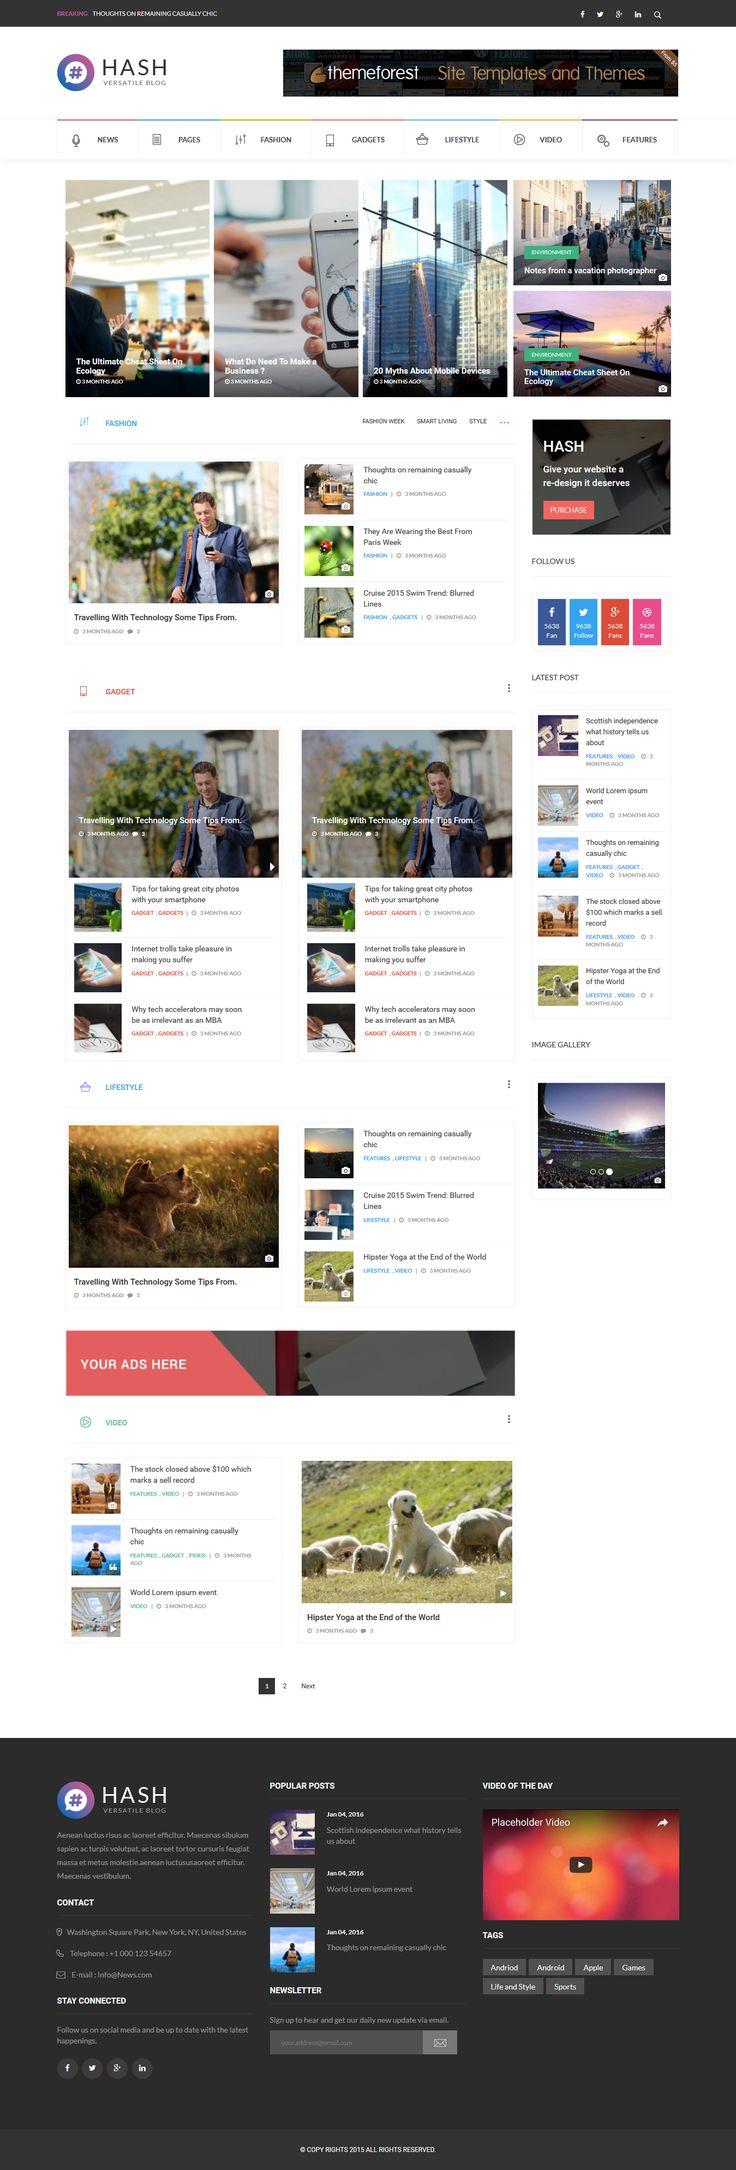 Hash - Responsive WordPress Magazine Theme